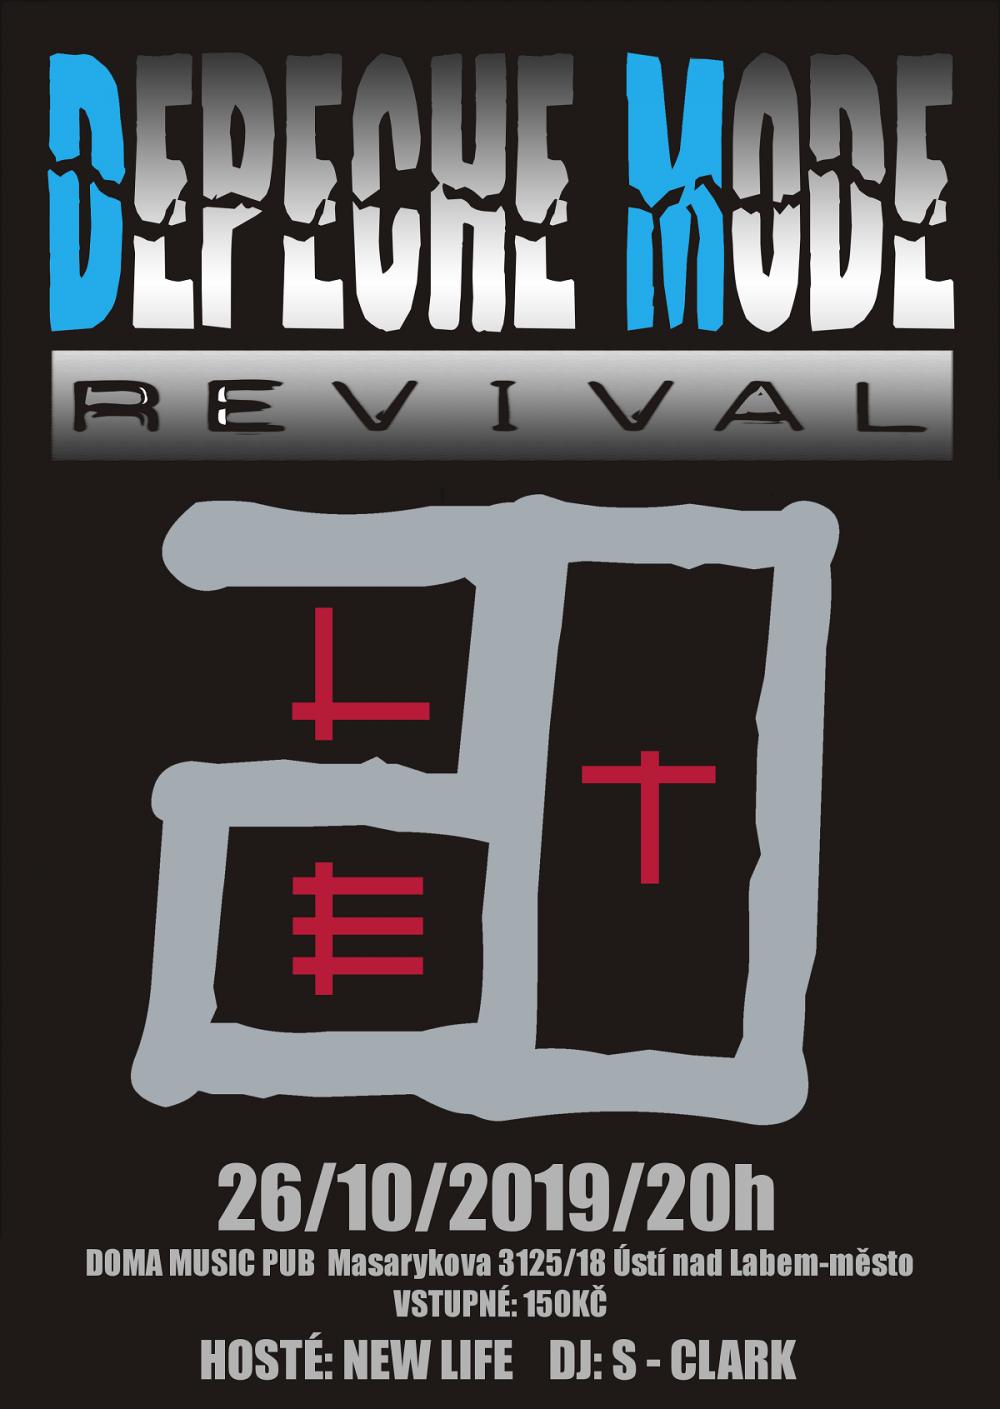 Ústí nad Labem: Depeche Mode Revival - 20 let